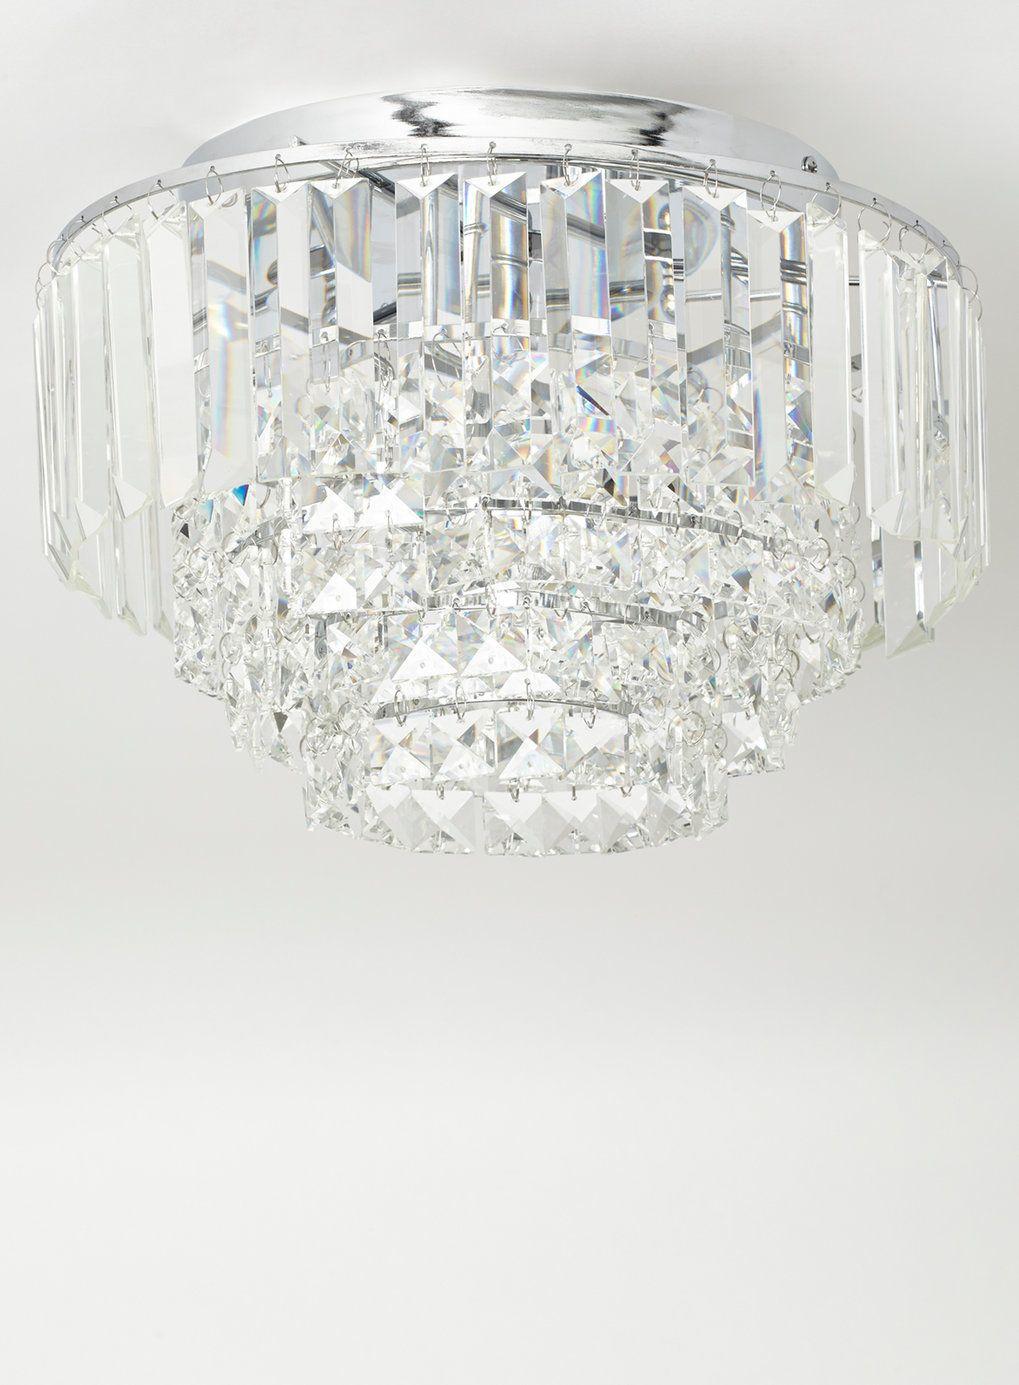 Photo 2 of Paladina Flush Fit Ceiling Light | House Ideas ...